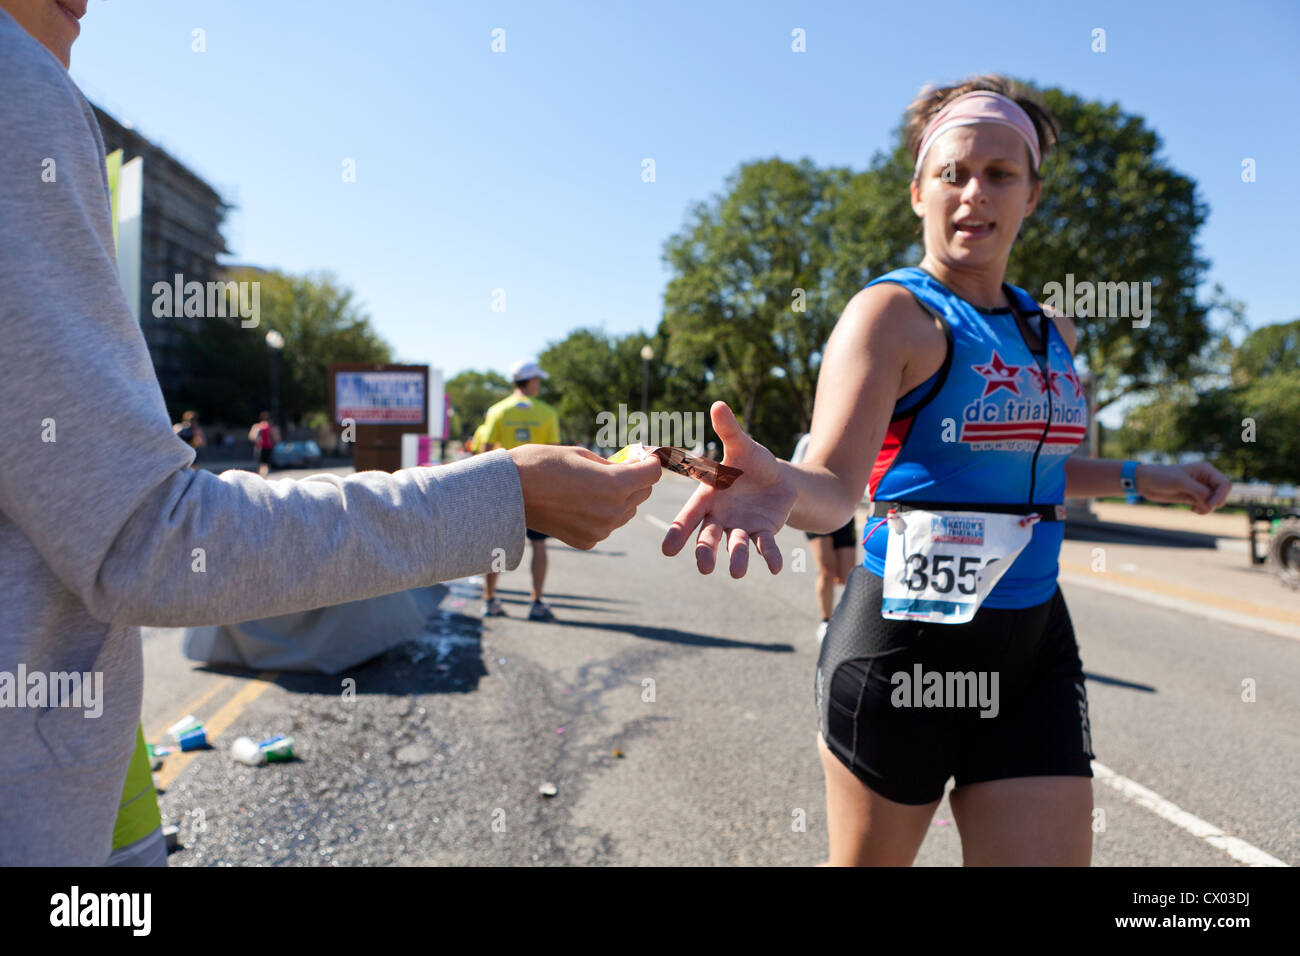 Marathon runner reaching for an energy gel packet - USA - Stock Image